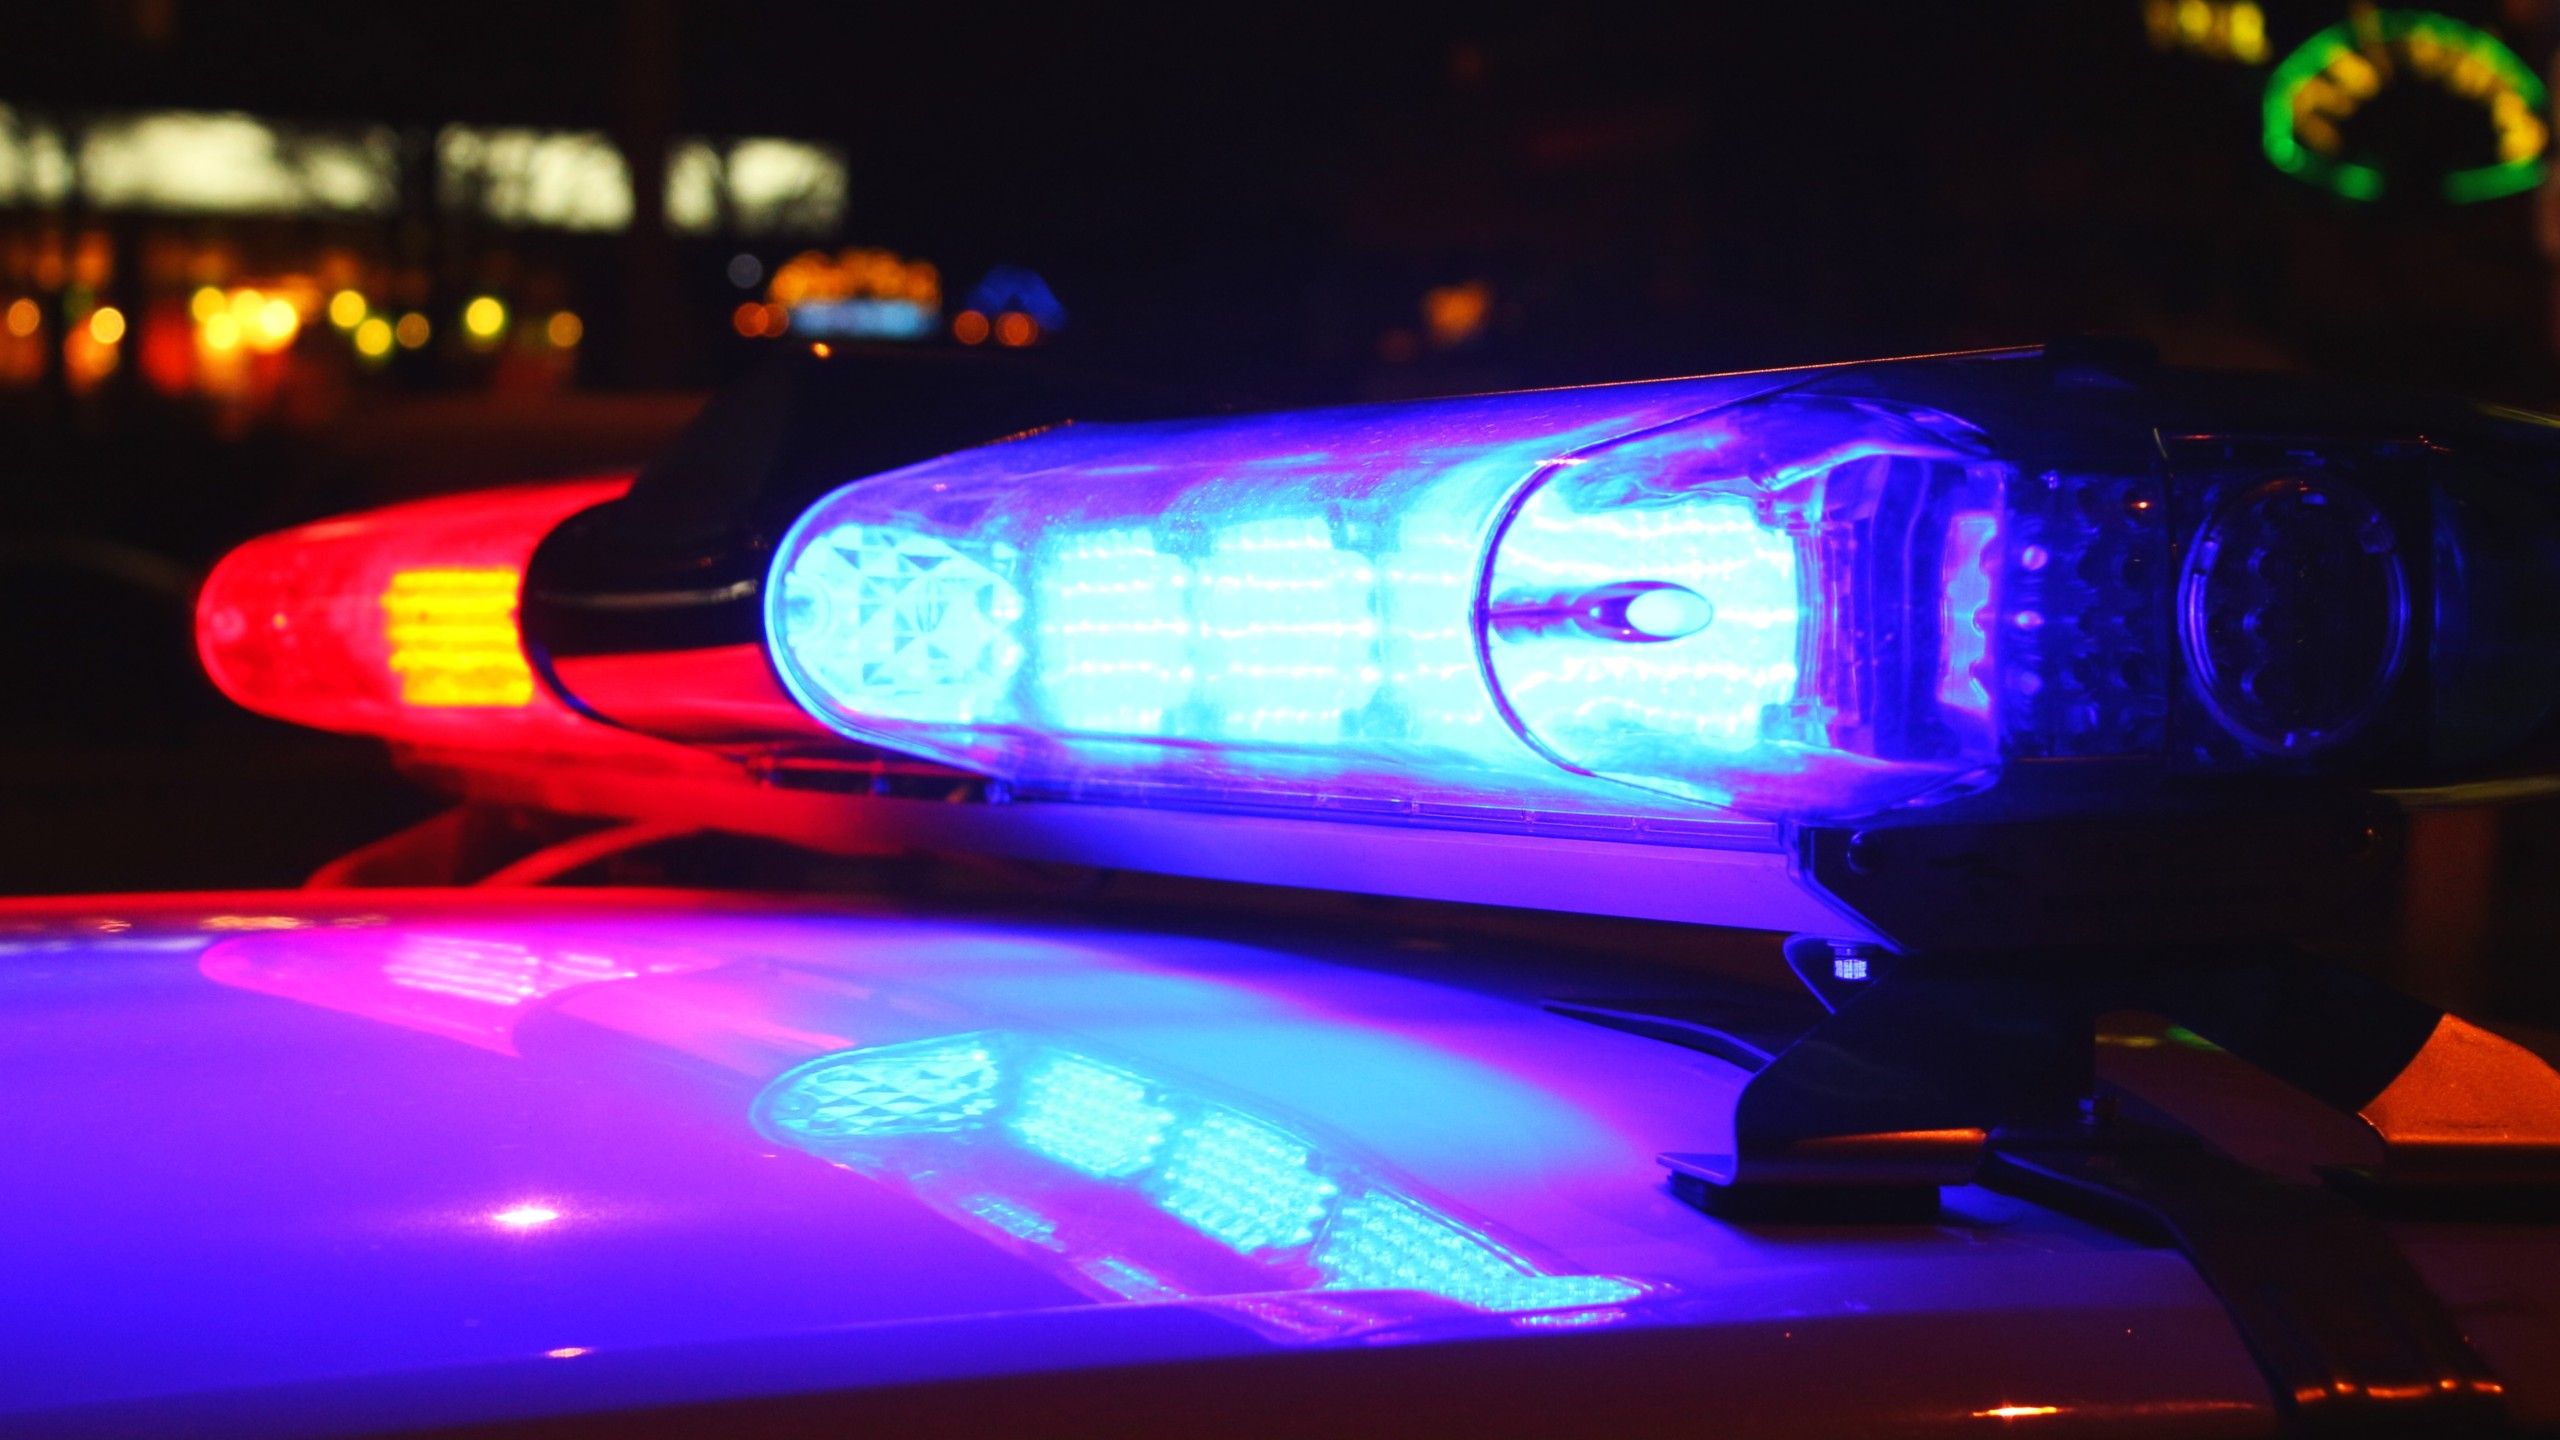 Generic police light image